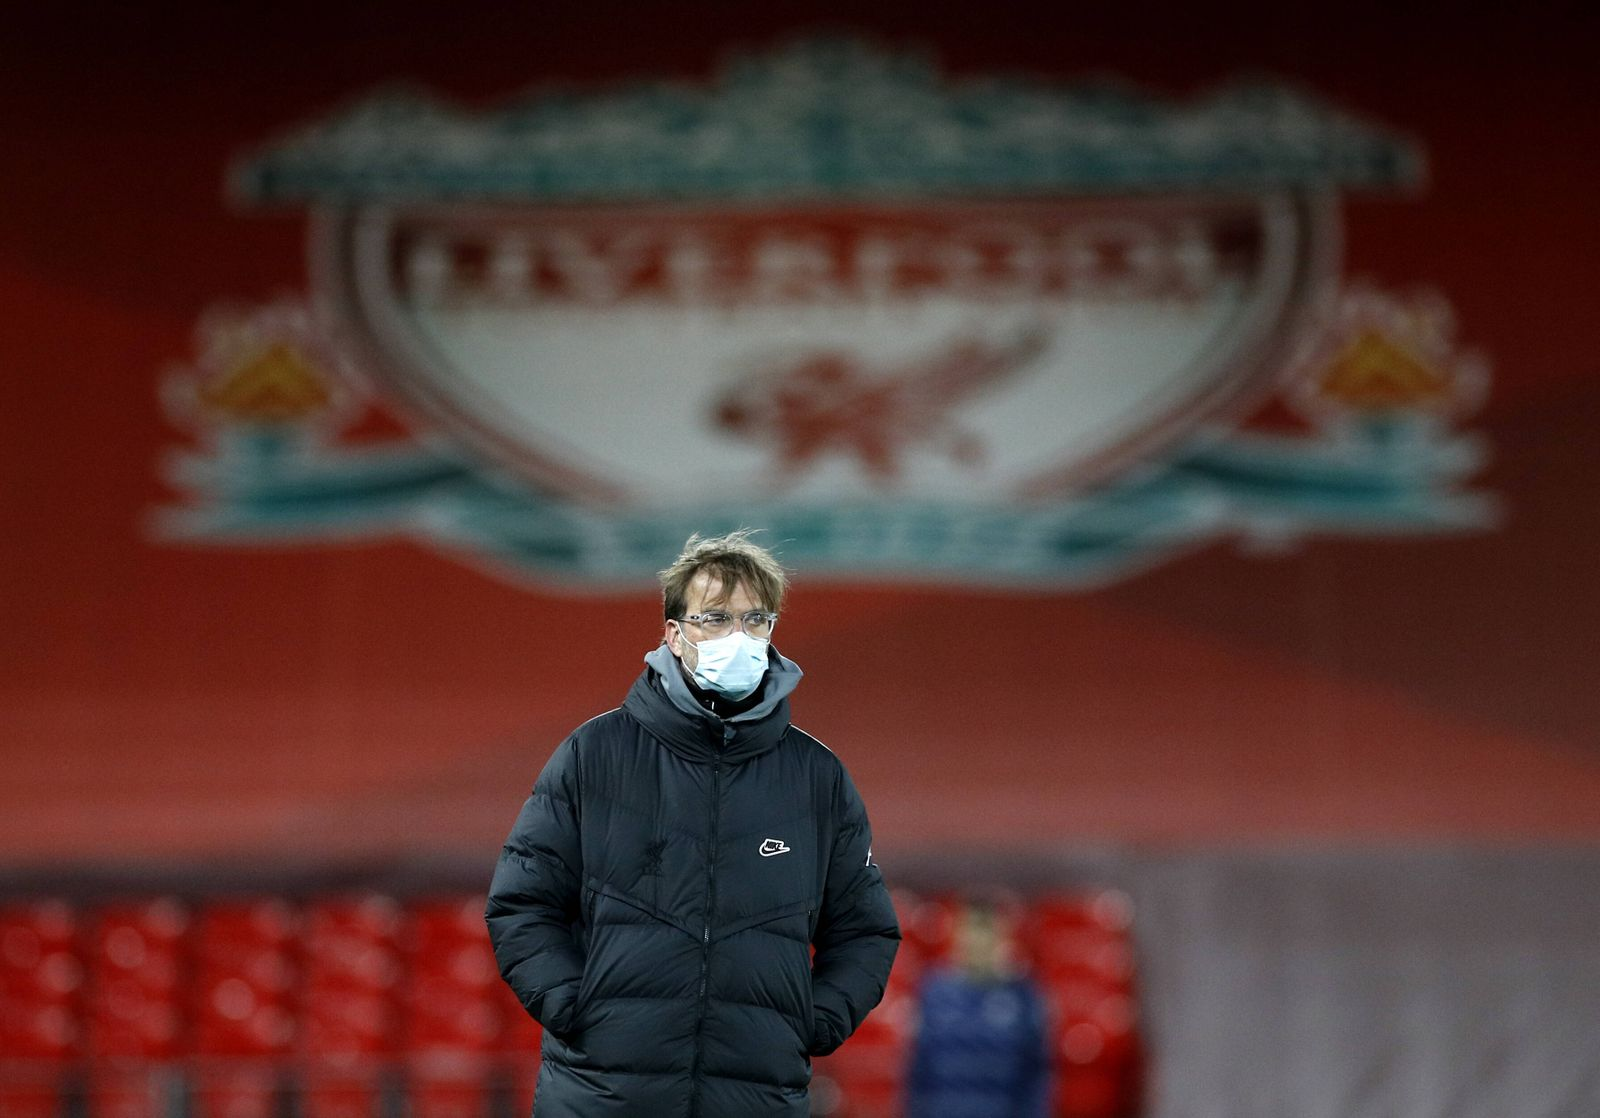 Liverpool v Chelsea - Premier League - Anfield Liverpool manager Jurgen Klopp prior to the Premier League match at Anfi